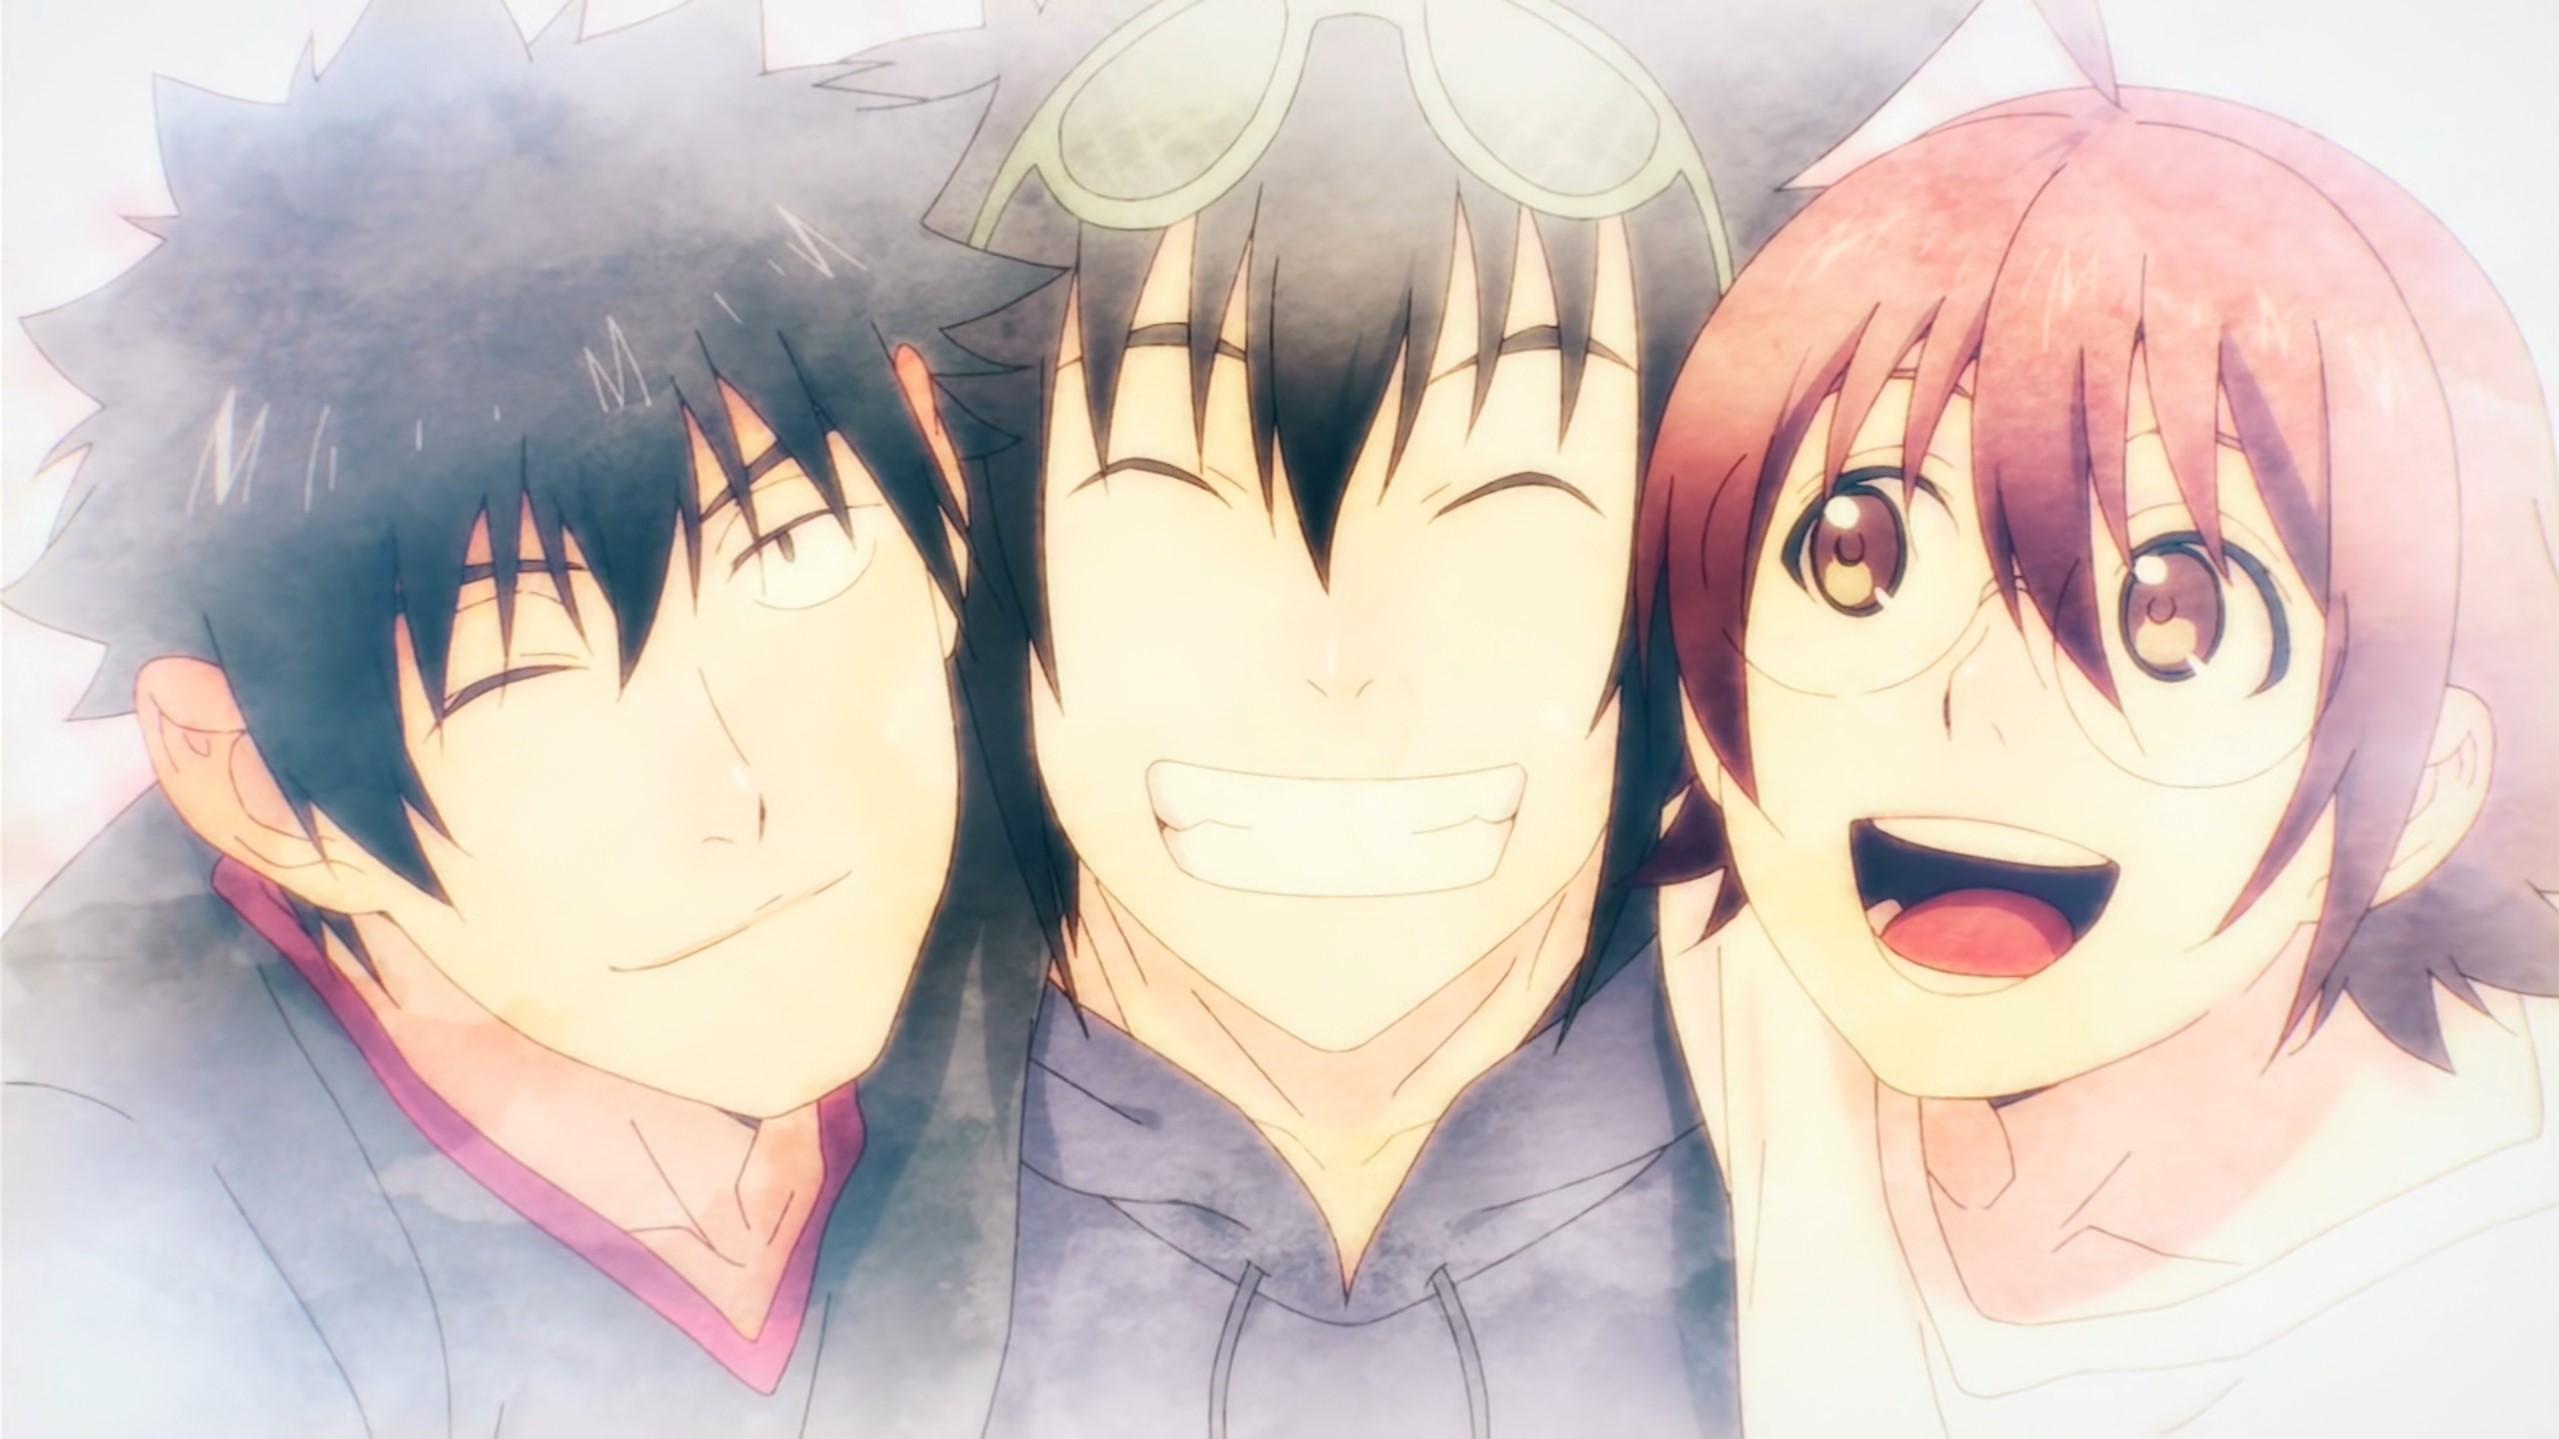 the three friends goh